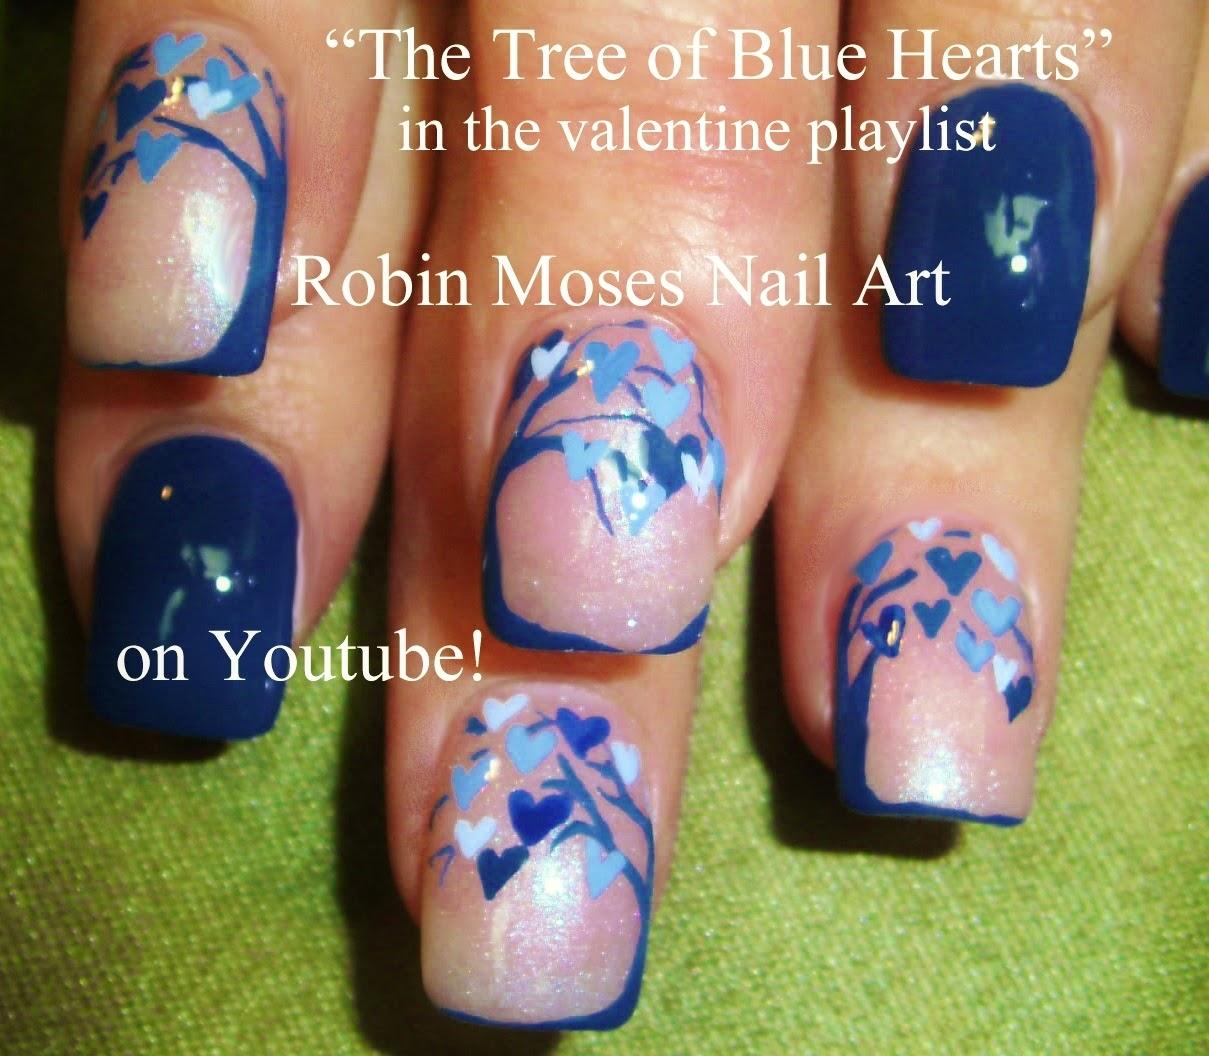 Robin moses nail art valentine nails cute valentine nails tree of love nail art prinsesfo Images